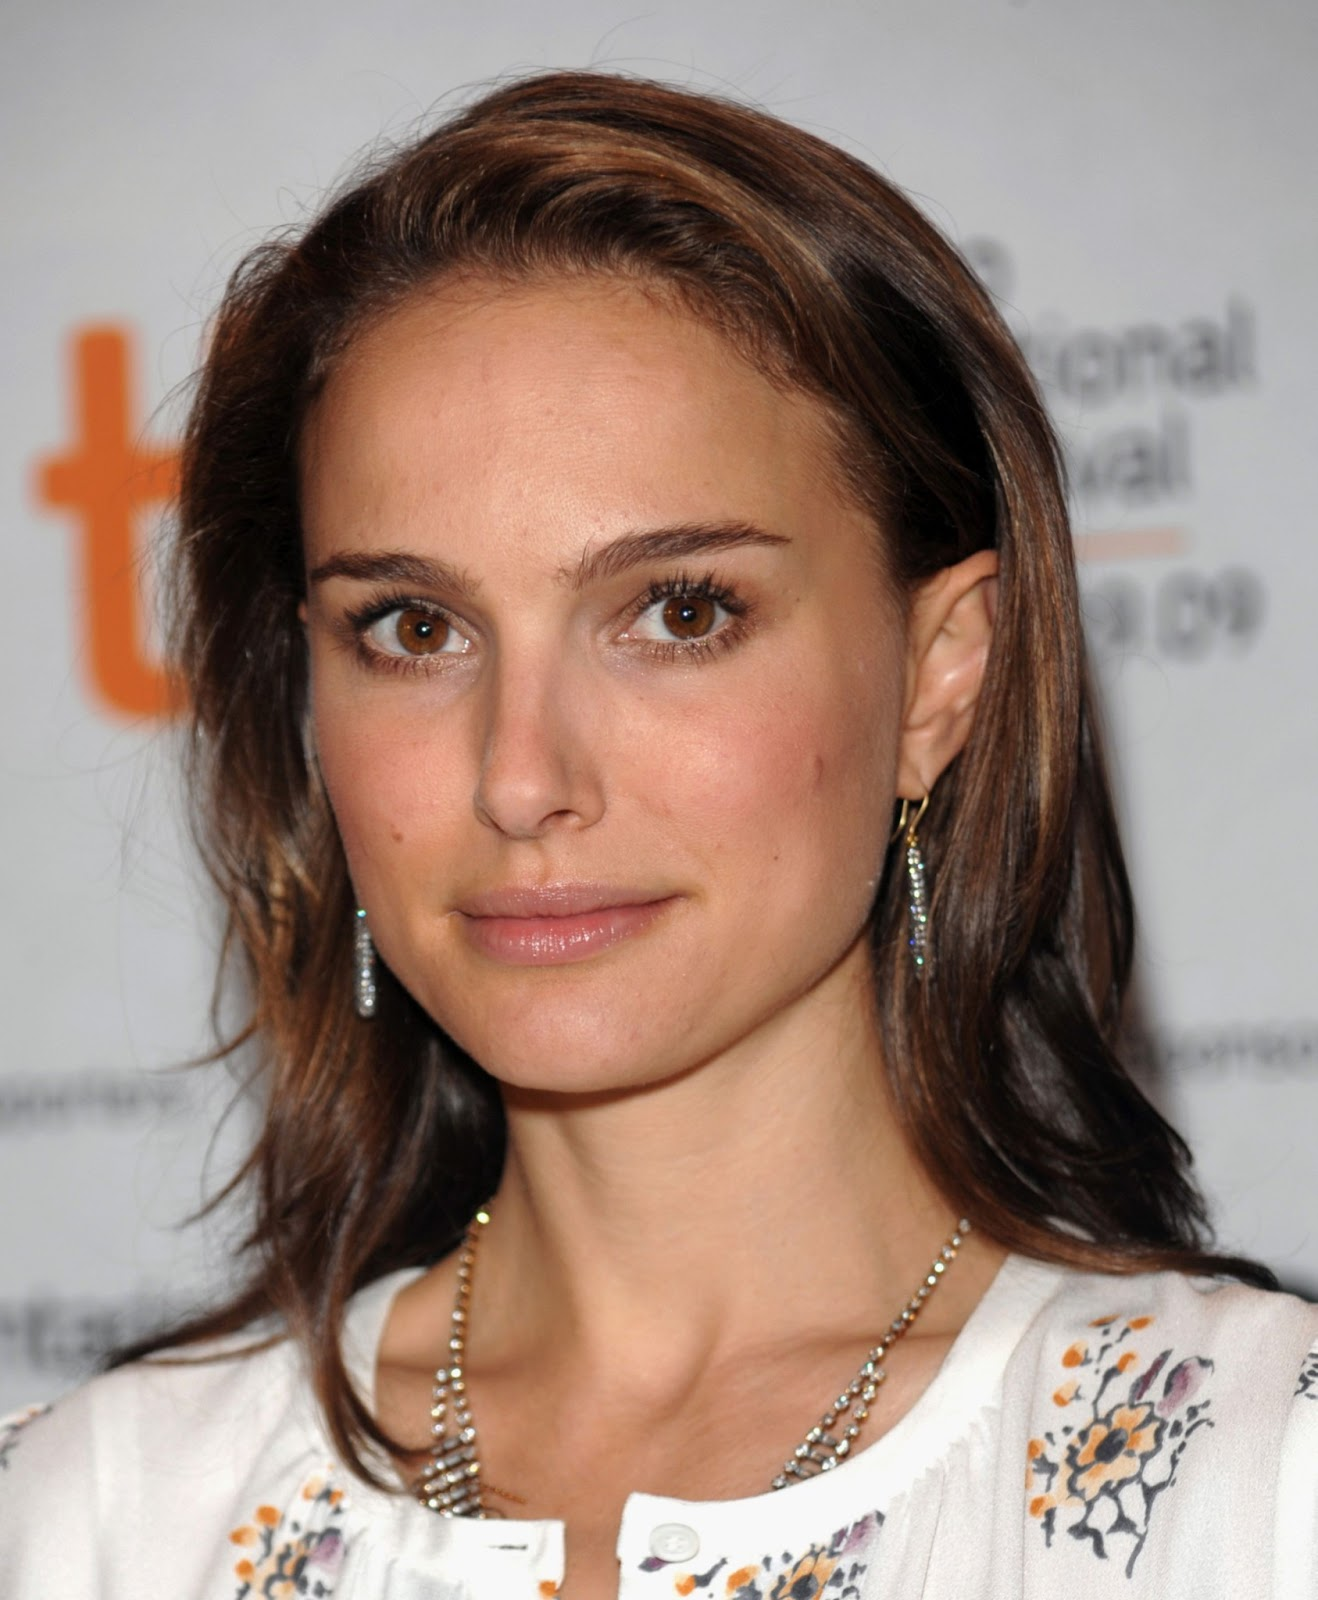 Natalie Portman Natalie Portman Body